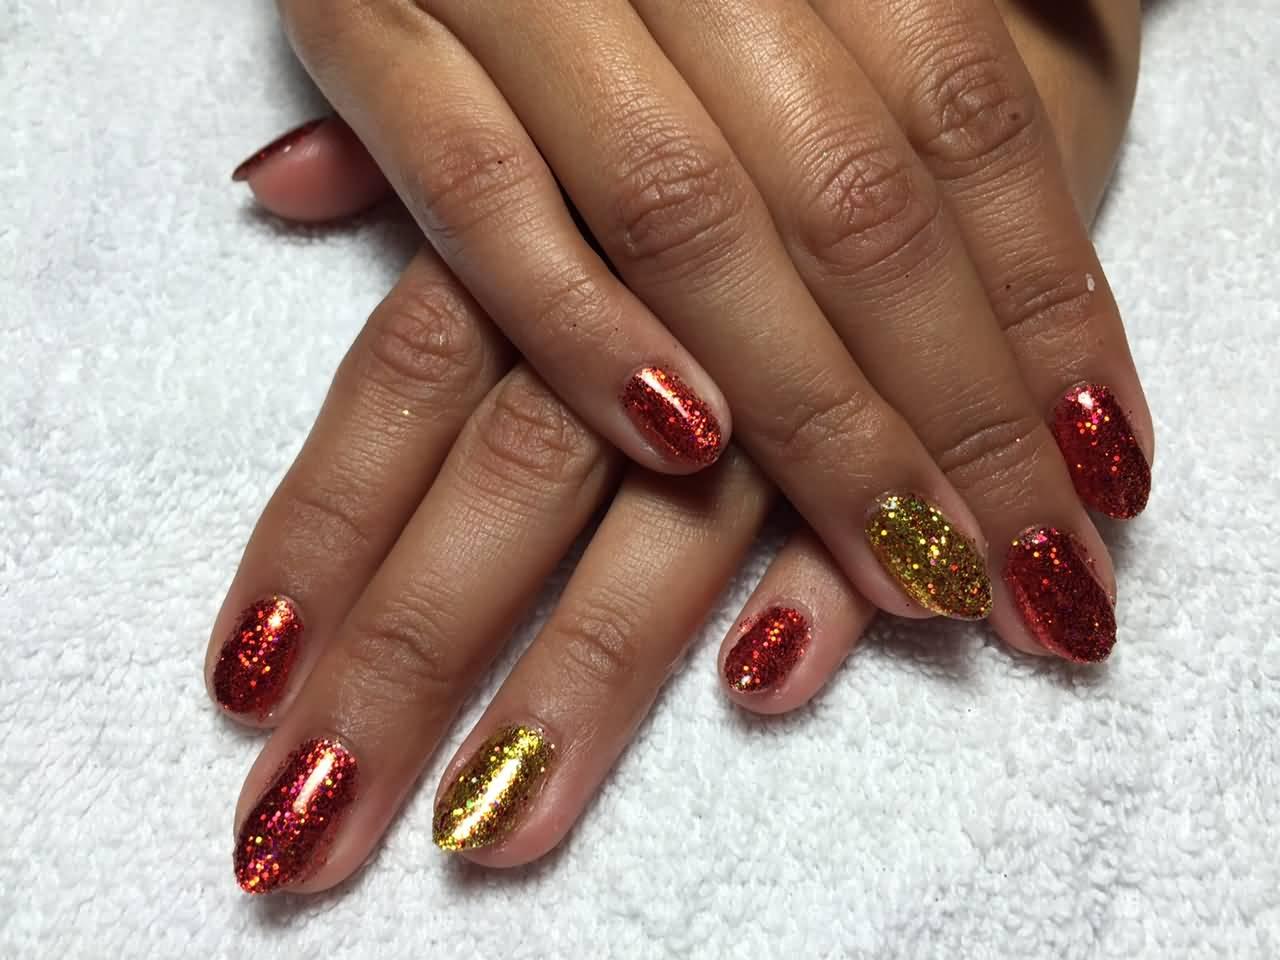 red and gold glitter nail art design idea - Nail Art Design Ideas